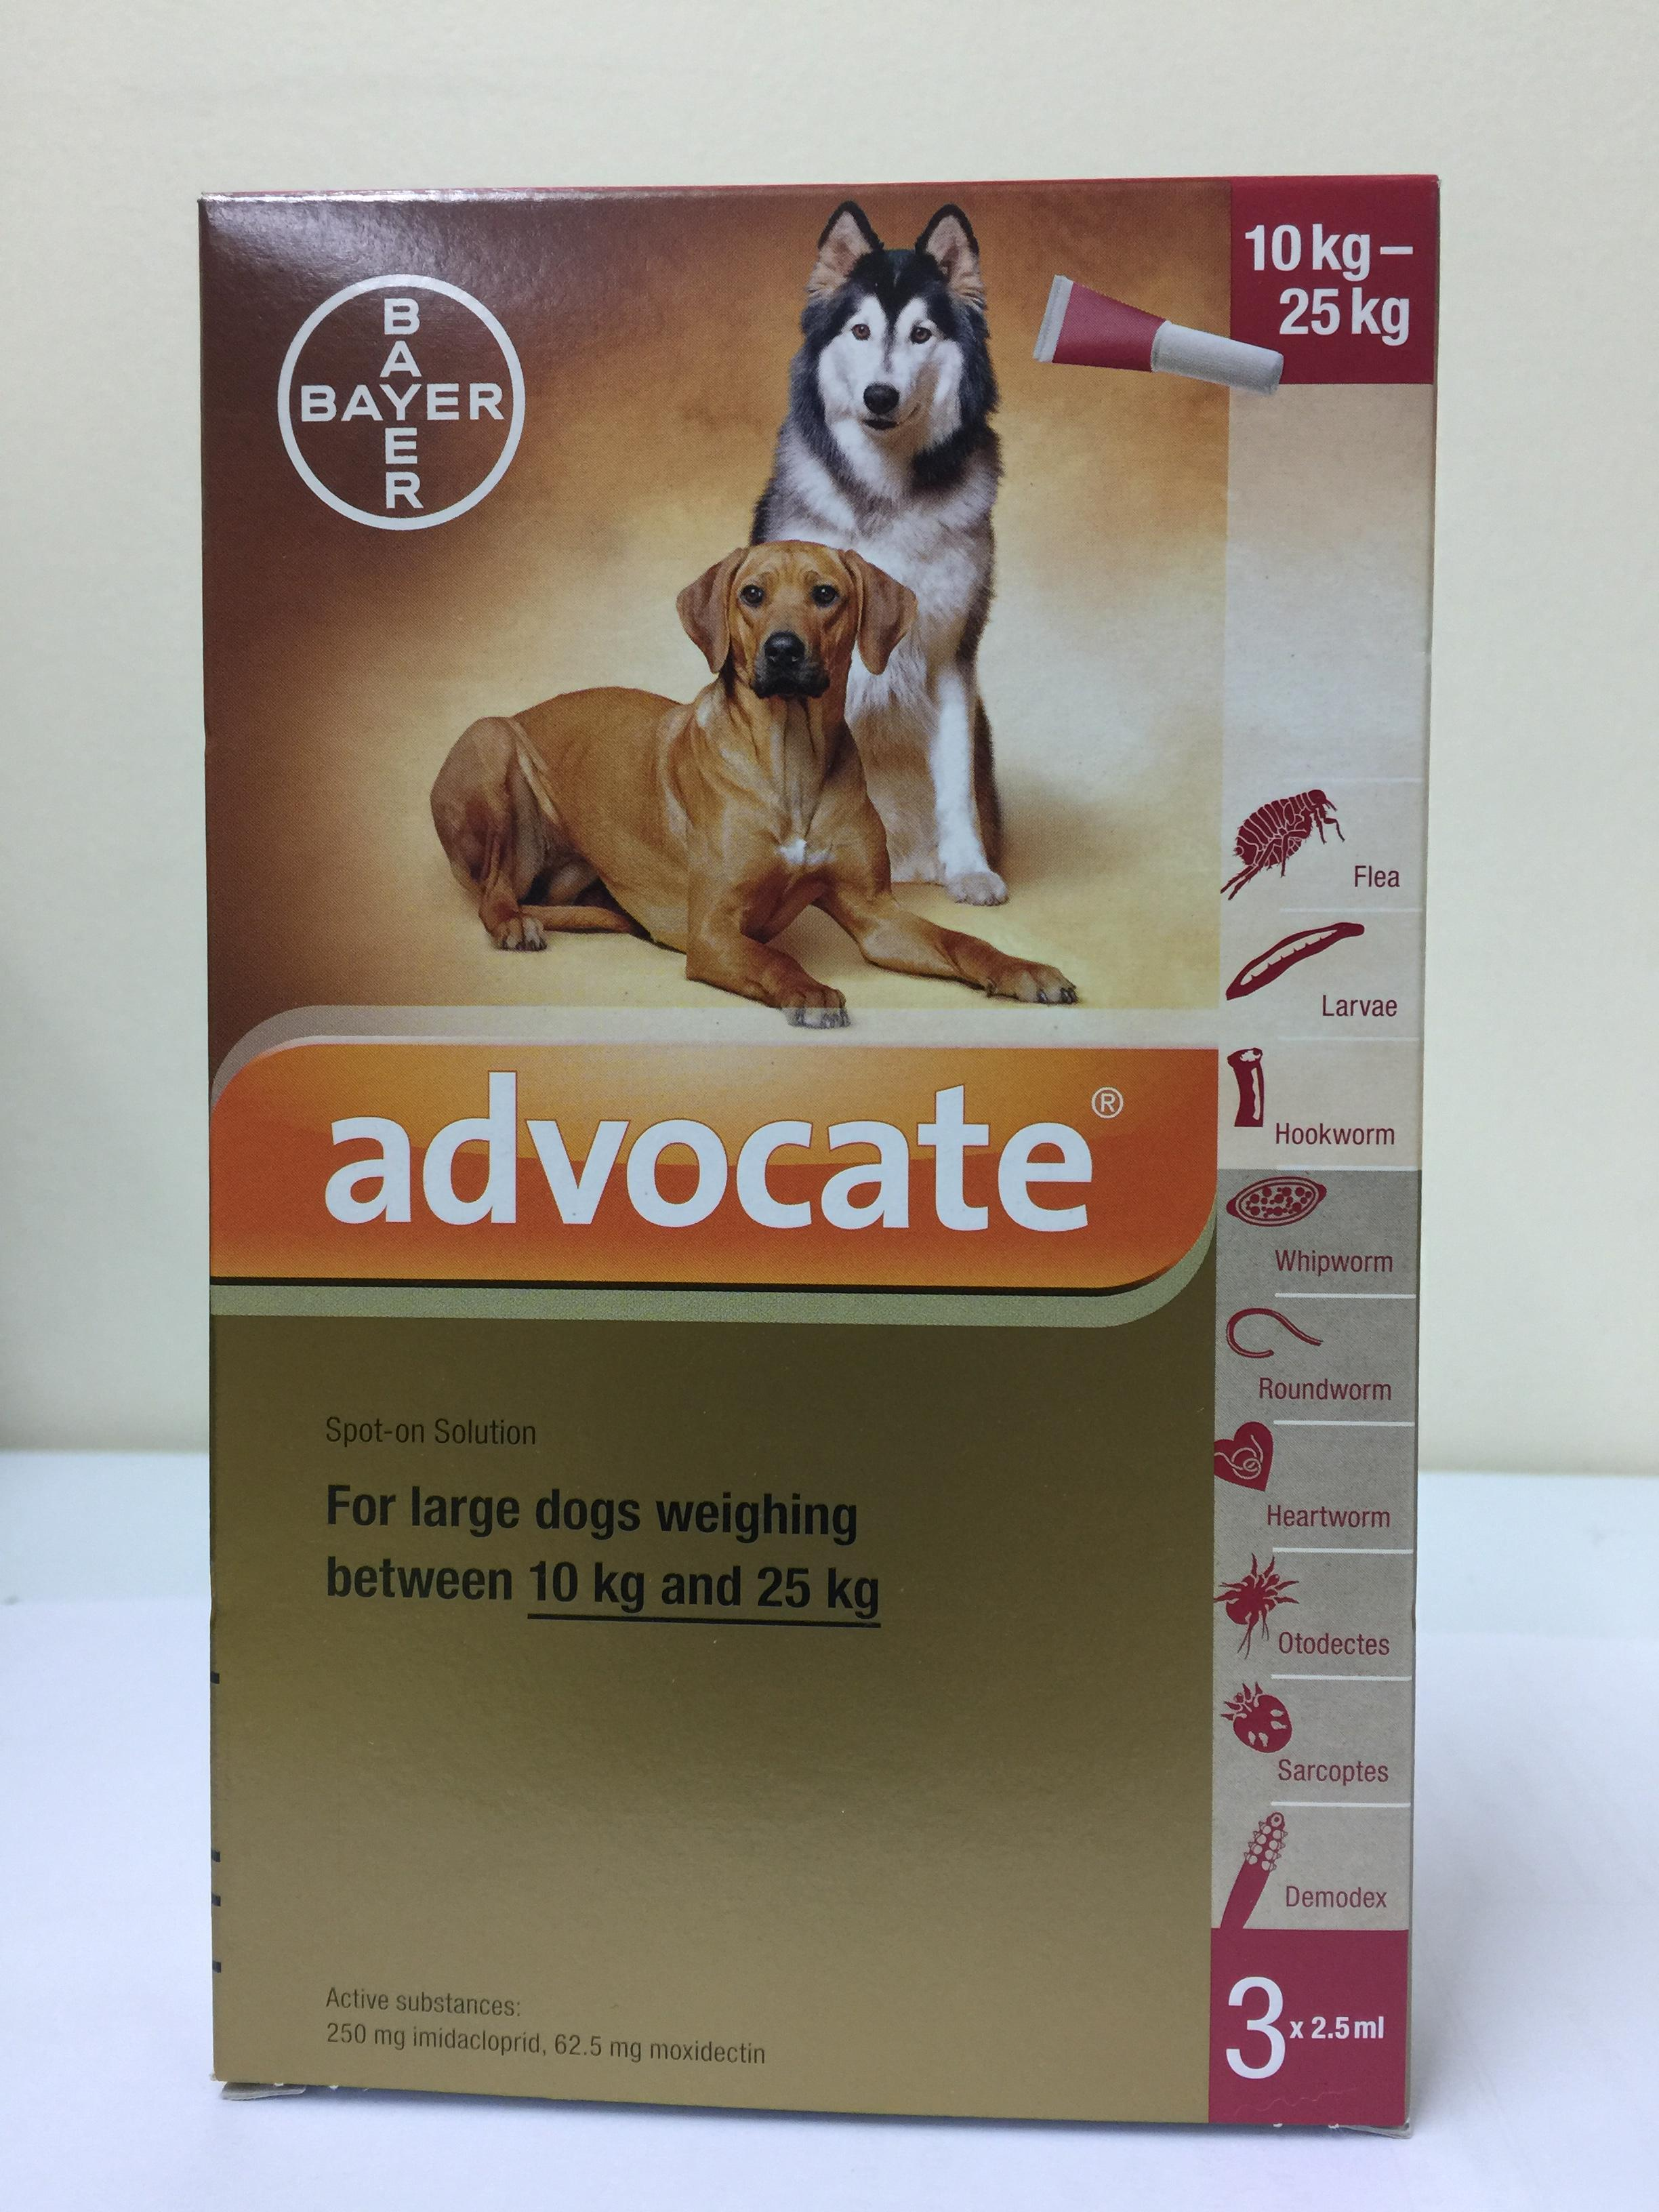 Bayer Advocate for dogs สำหรับสุนัข 11-25 kg บรรจุ 3 หลอด Exp.11/18